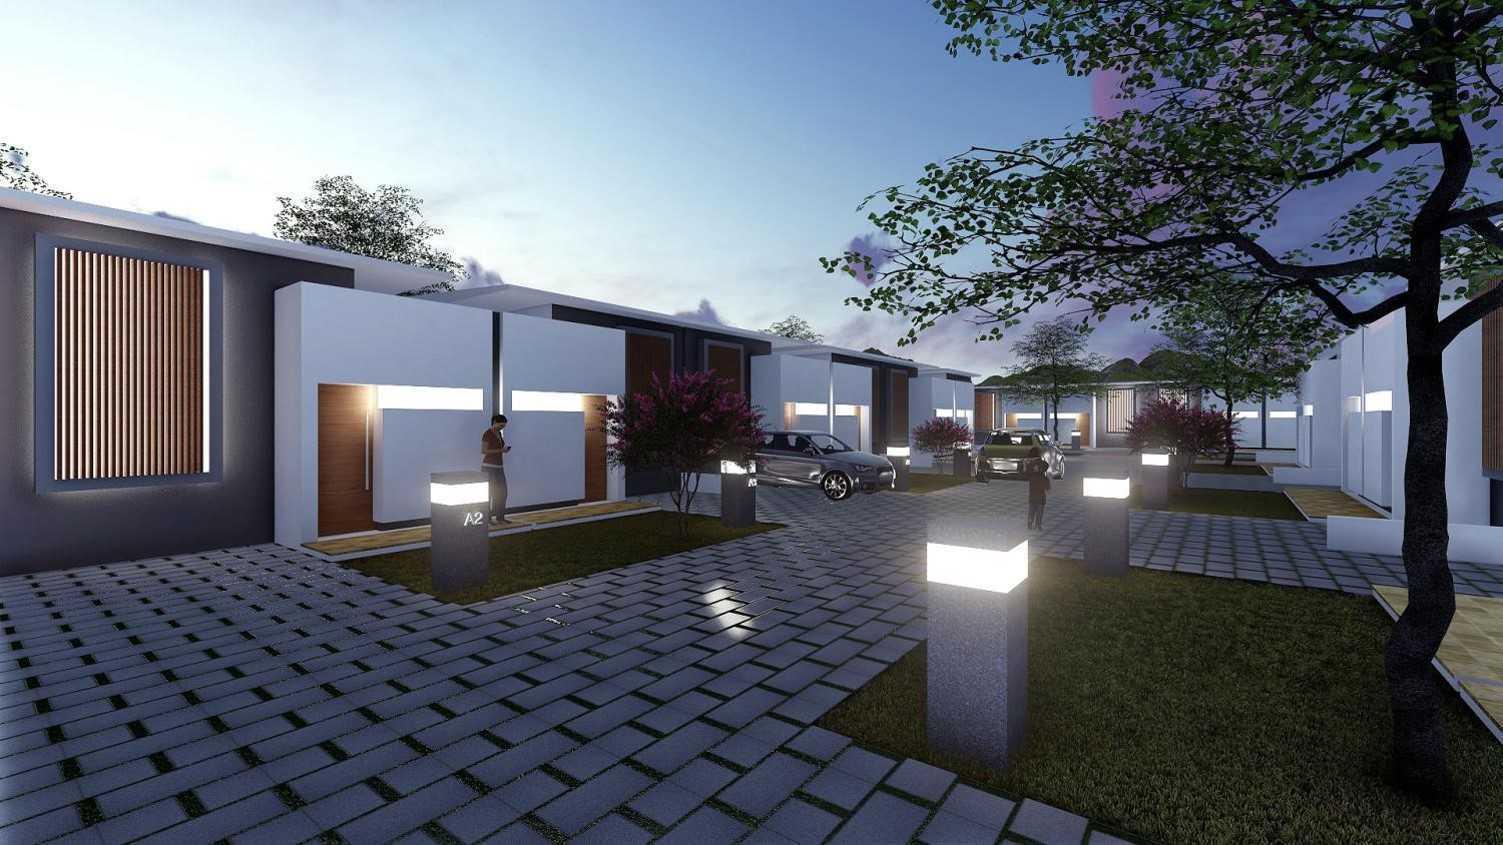 Alien Design Consultant C Residential Citeureup Citeureup Picture1   8392